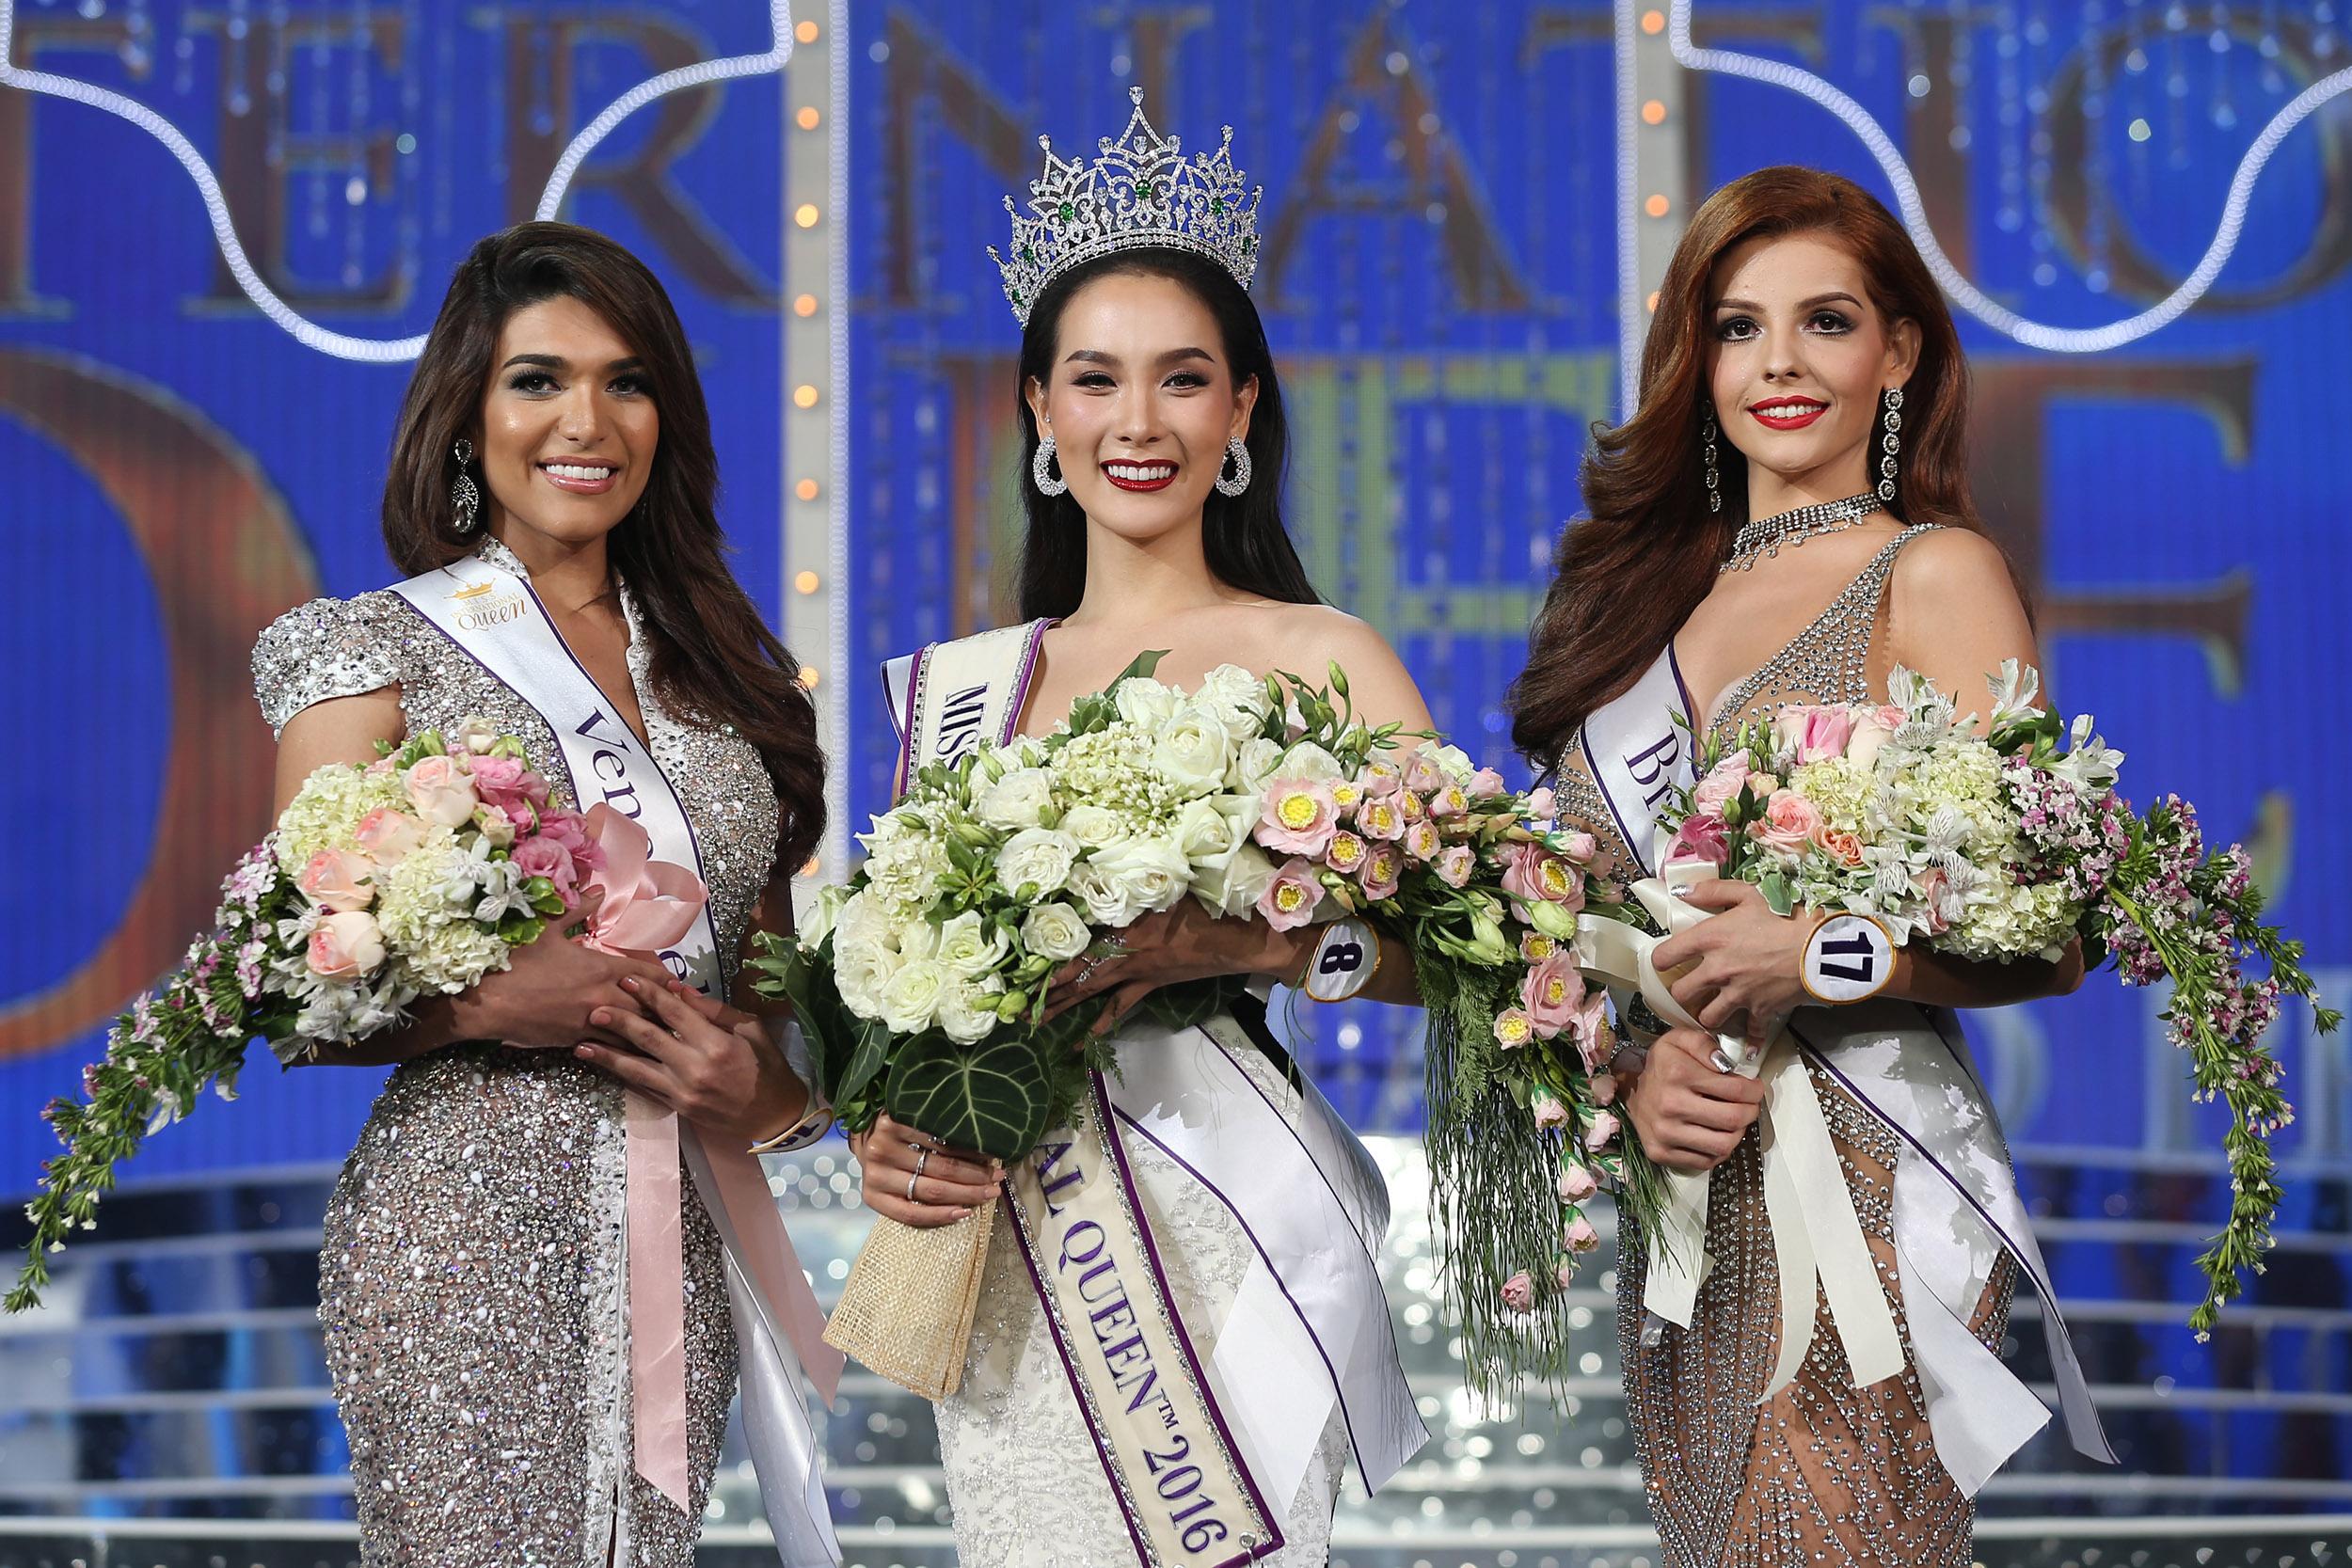 Miss International Queen มิสอินเตอร์เนชั่นแนลควีน สาวประเภทสอง โม จิรัชยา